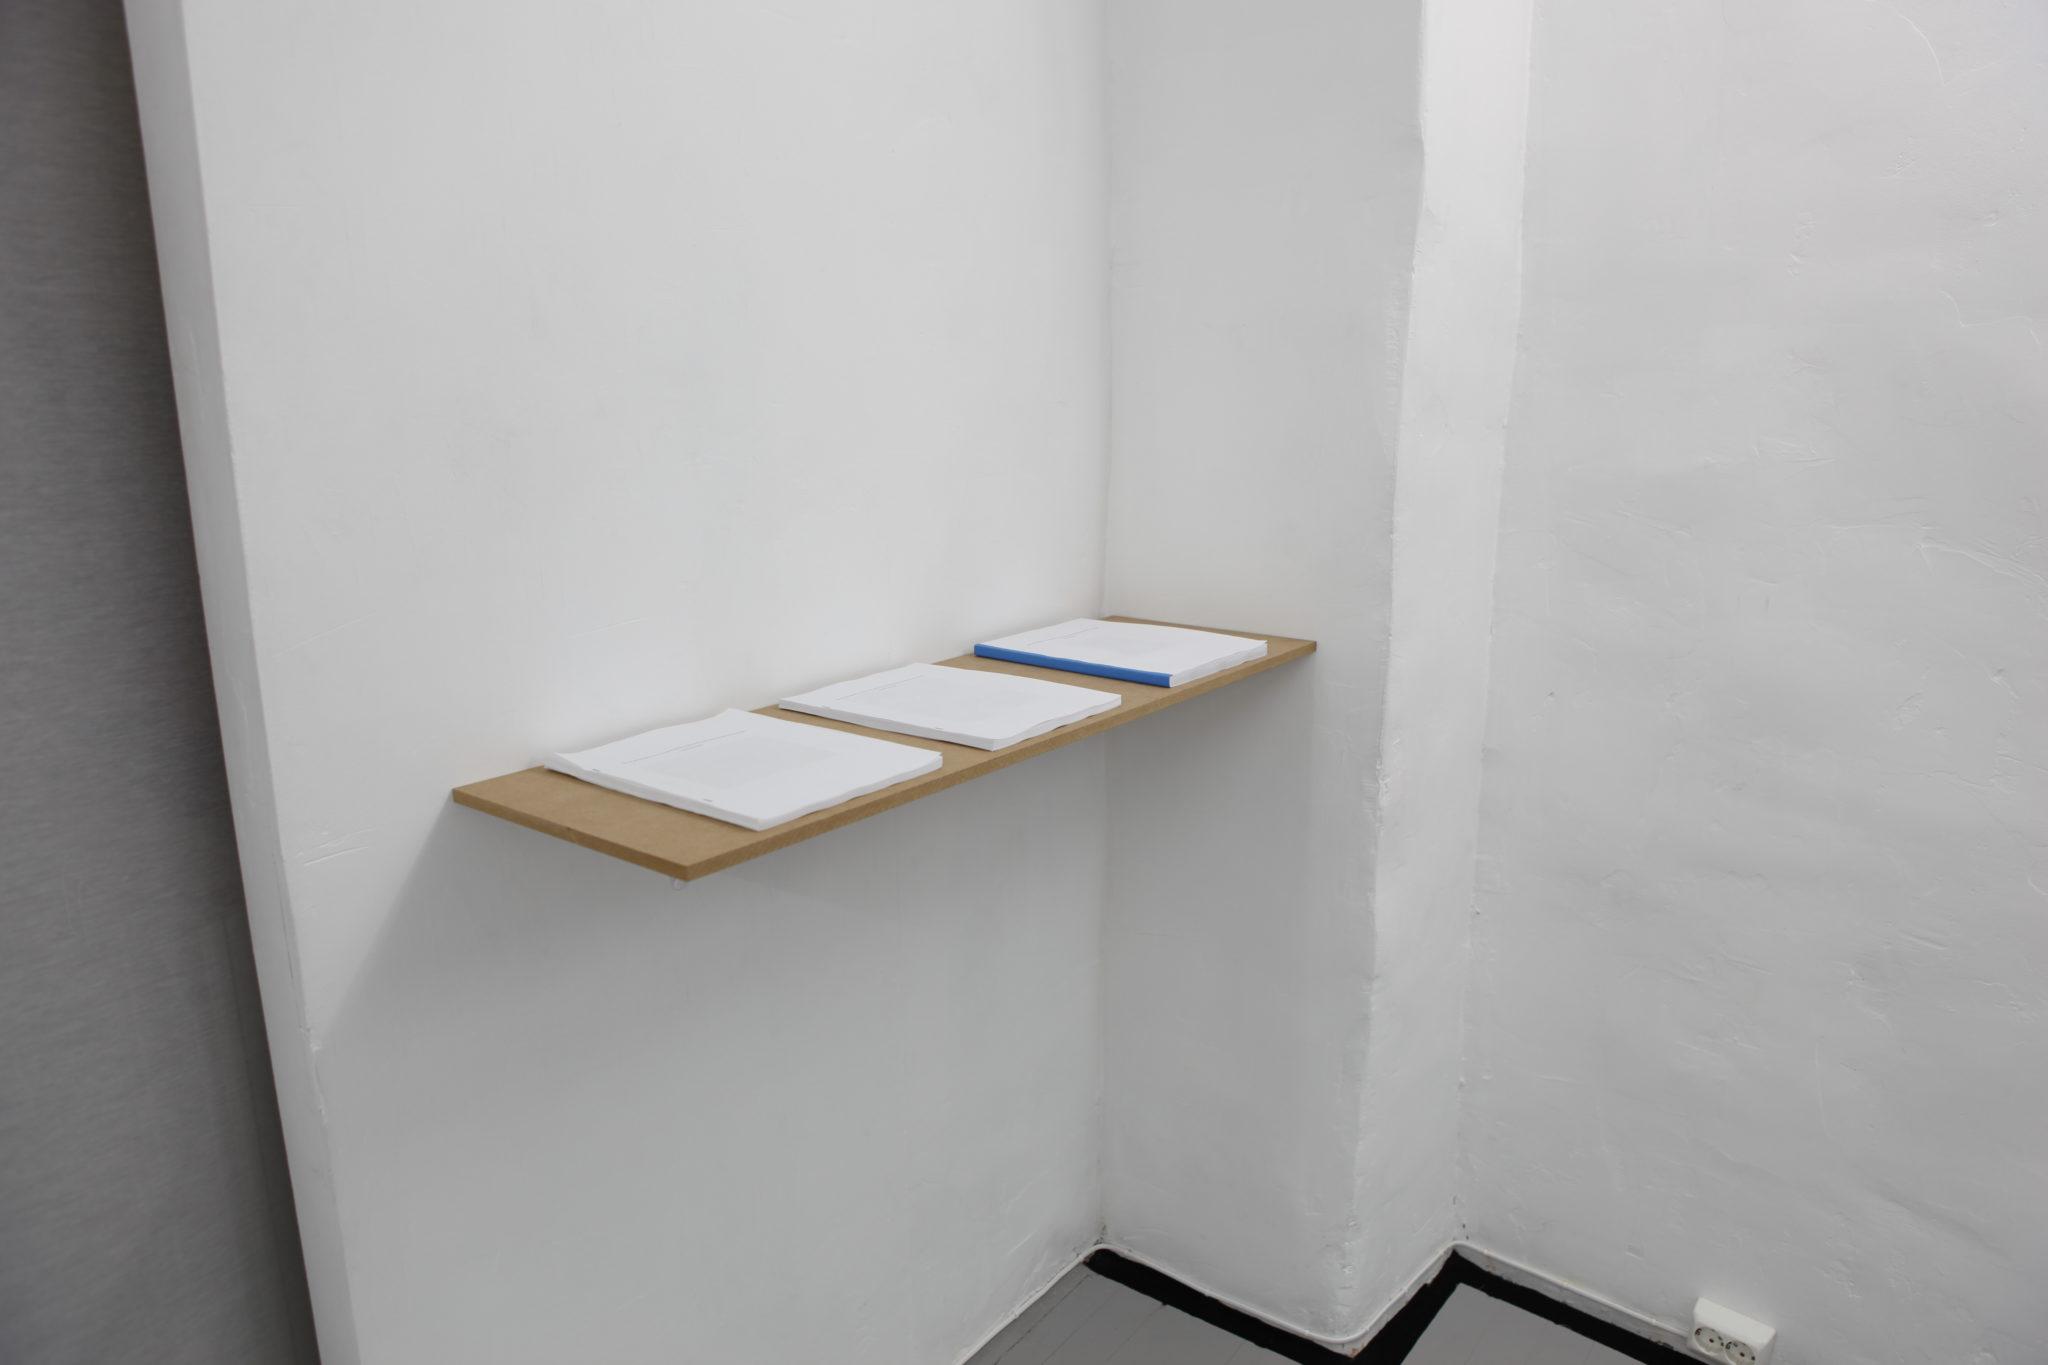 Installation view David Schoerner installation view at MELKat MELK january 2011